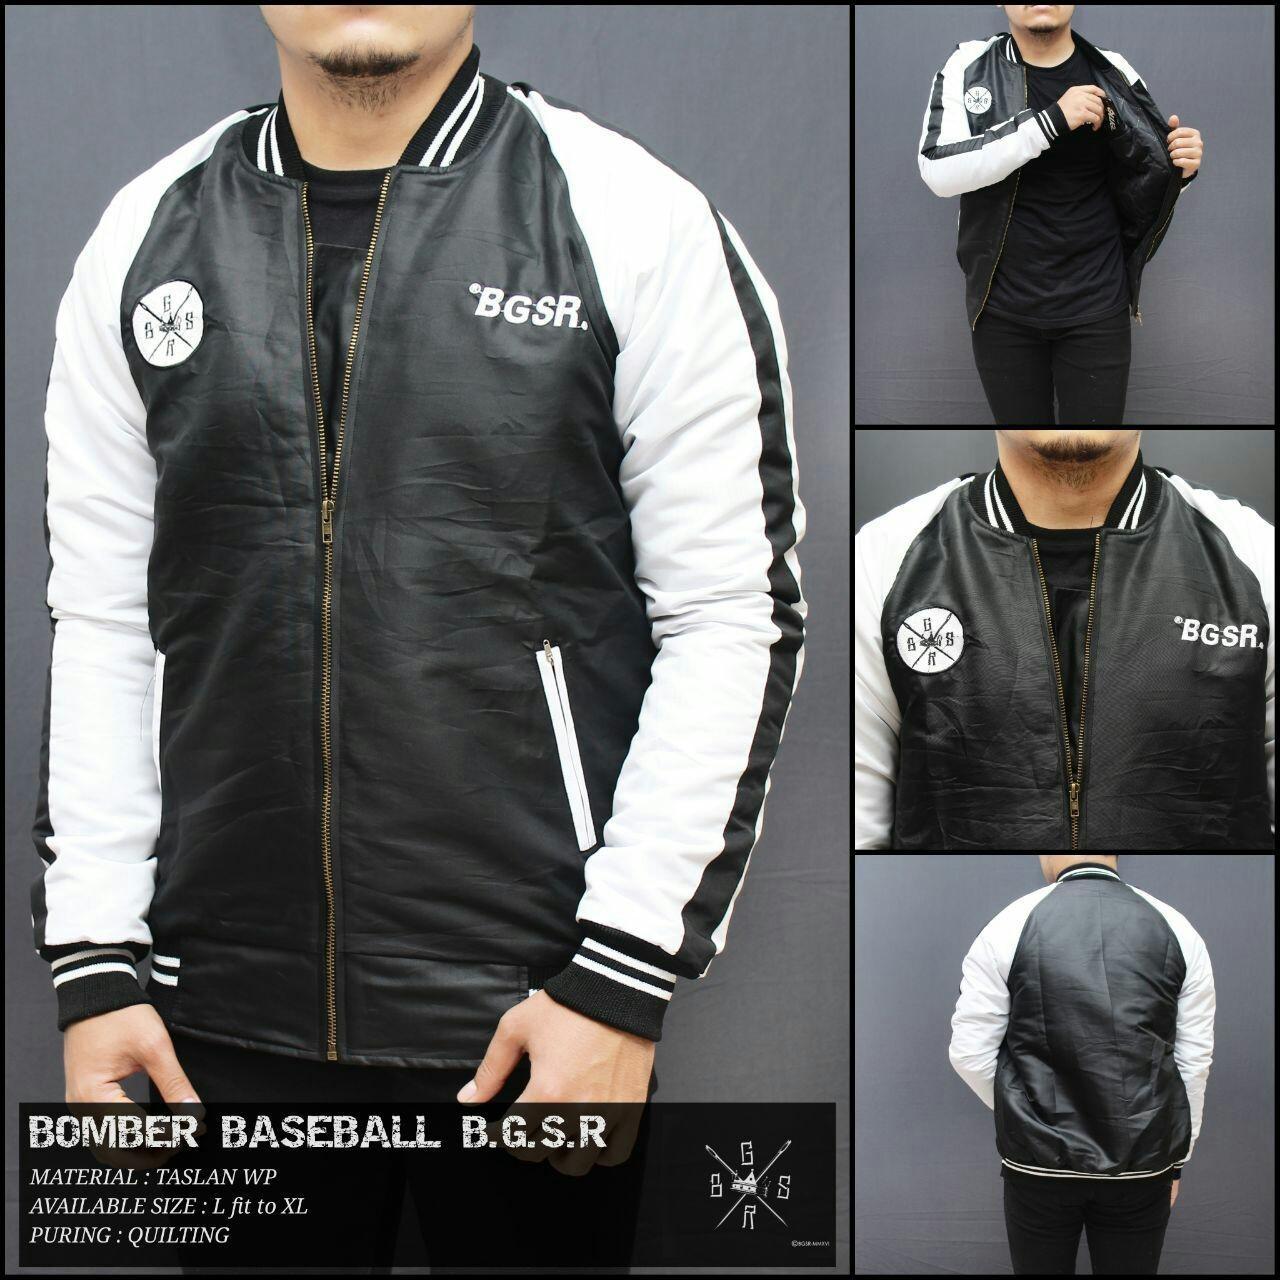 Atta Clothing / fashion pria / pakaian pria / jaket dan mantel pria / jaket pria / jaket bomber / jaket bomber baseball bgsr best seller